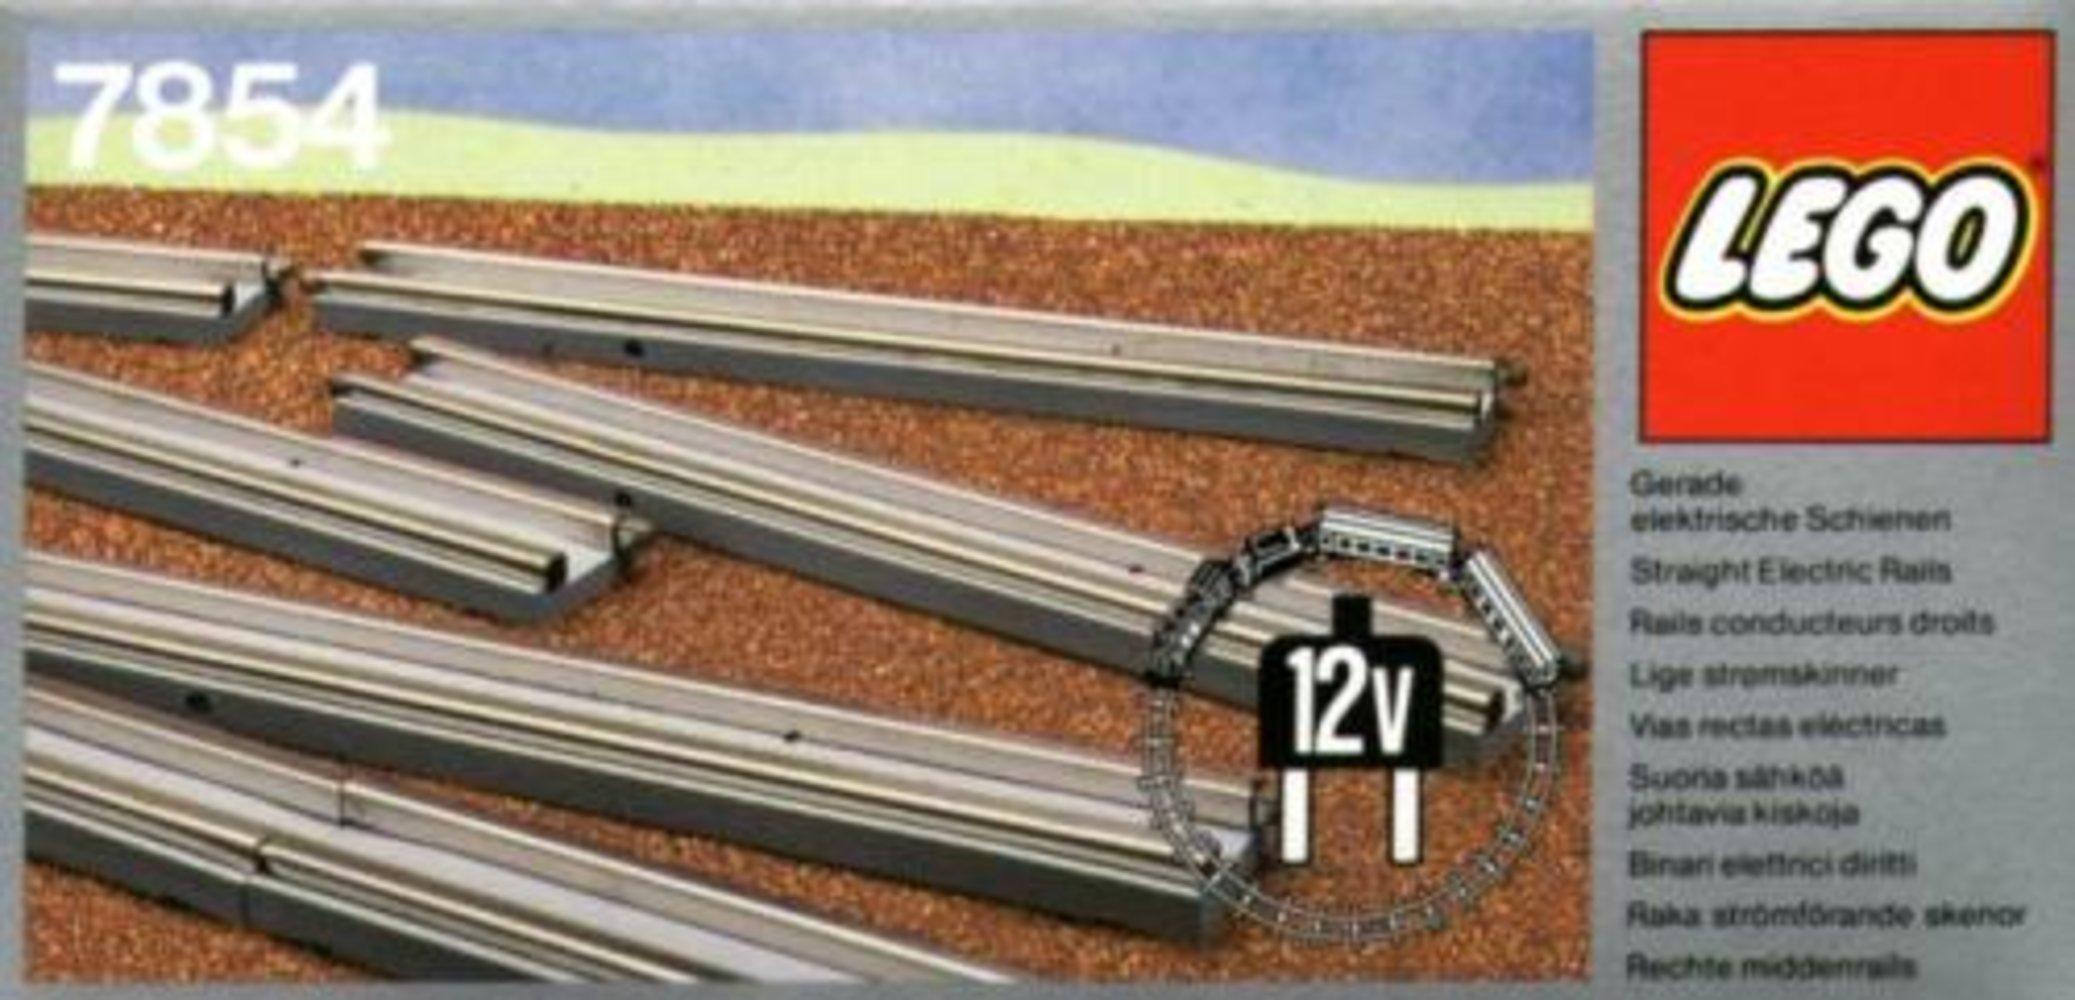 8 Straight Electric Rails Gray 12v